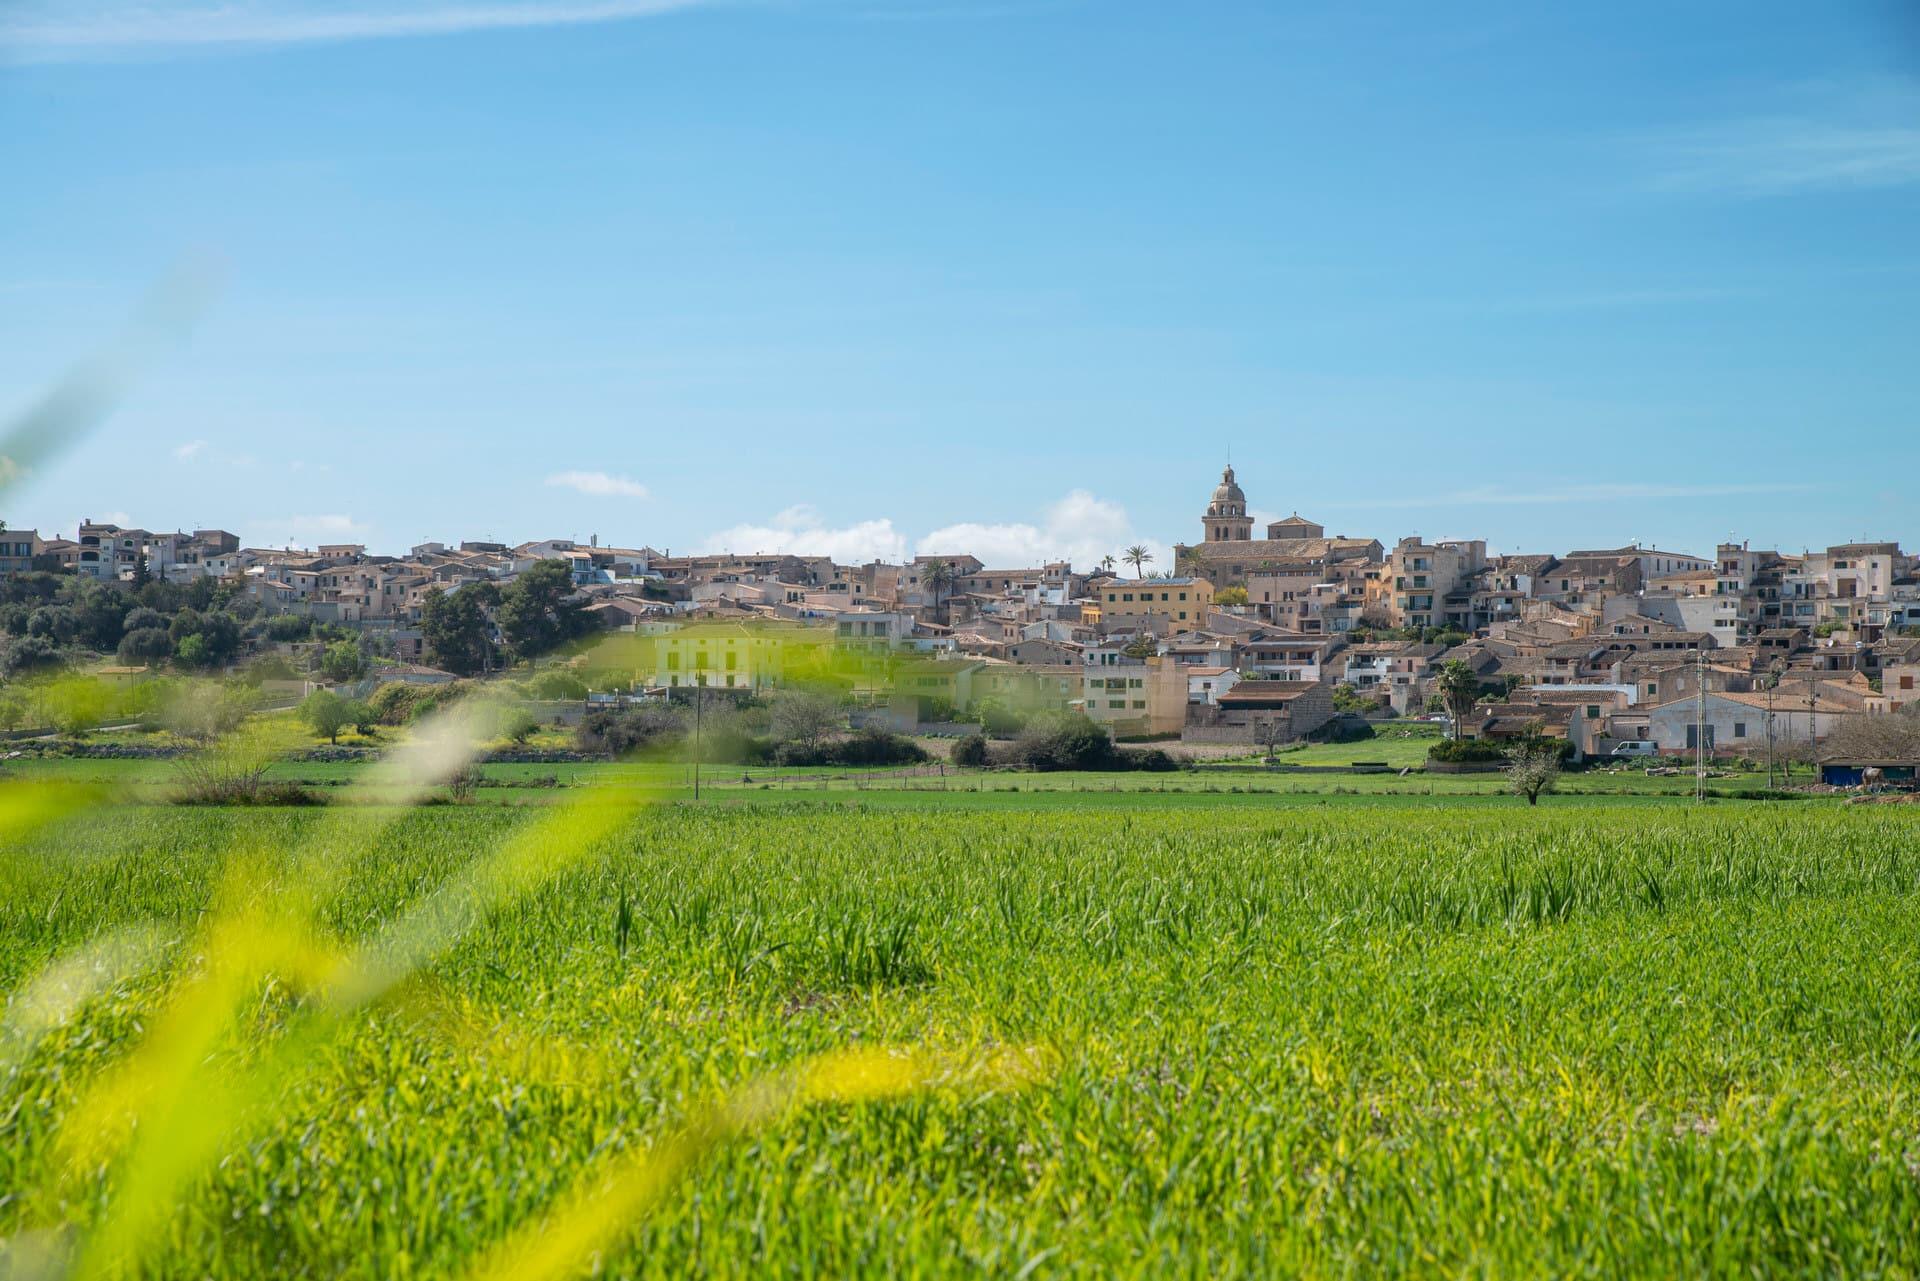 Dörfer Mallorcas – wir stellen vor: Montuiri